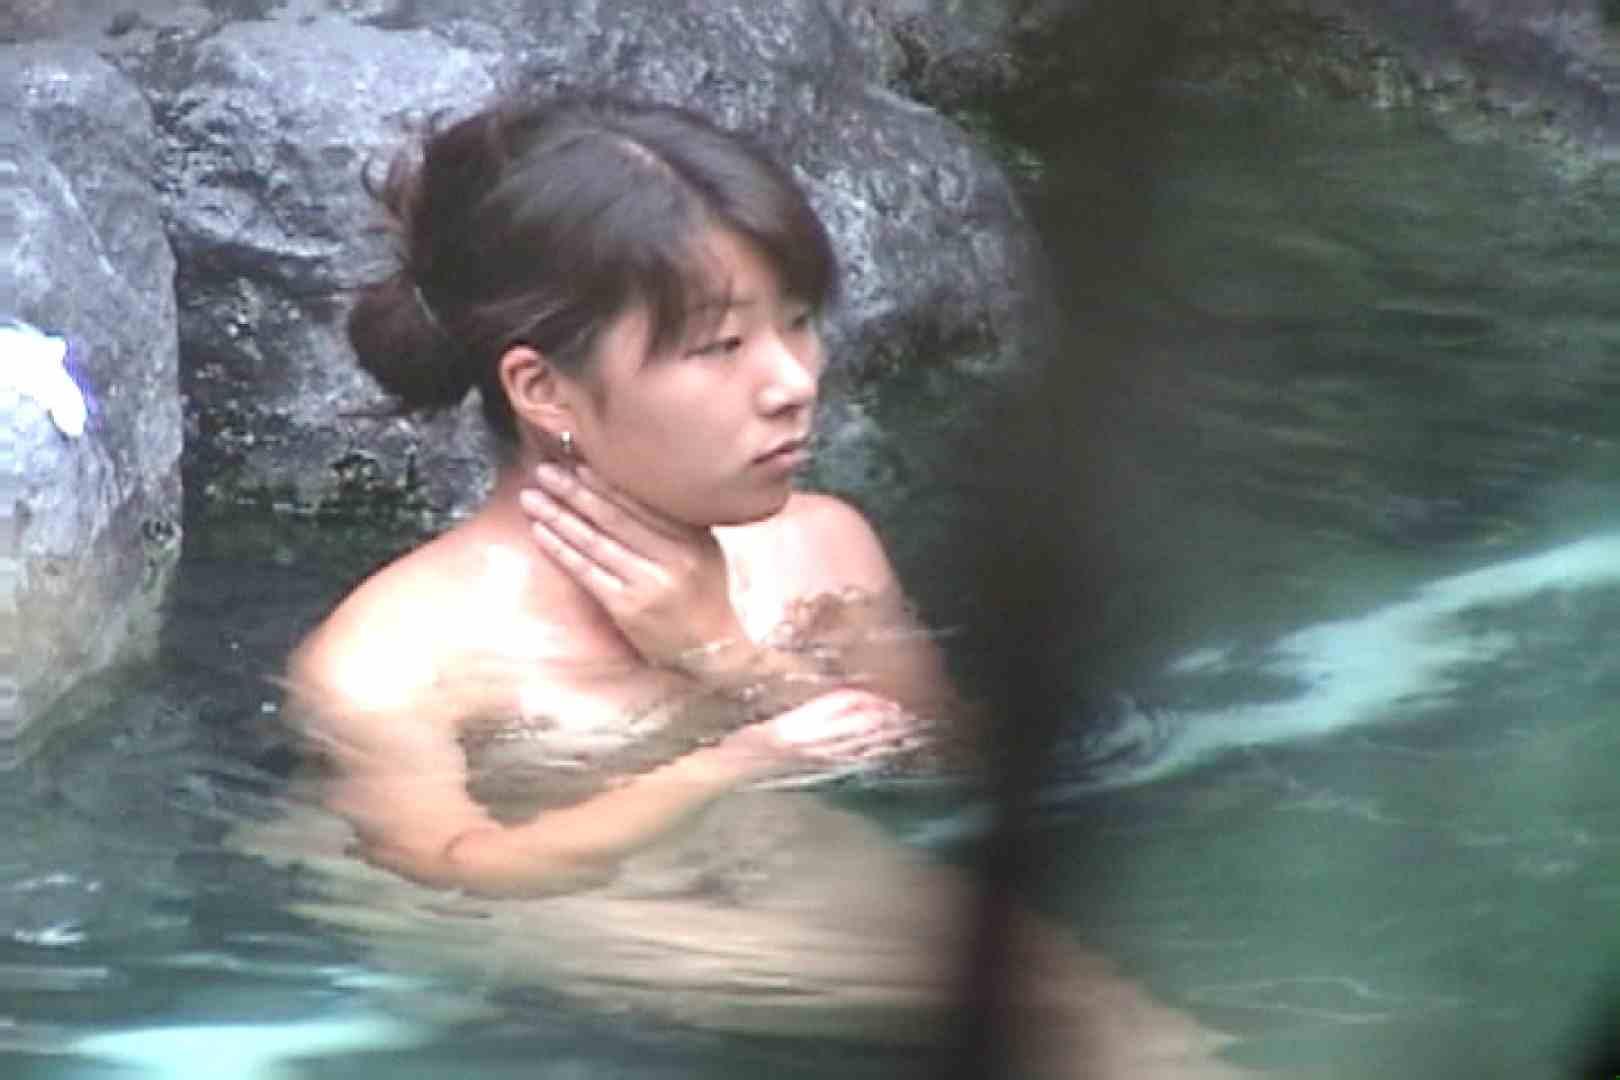 Aquaな露天風呂Vol.69【VIP限定】 OLのエロ生活   露天風呂  106連発 52